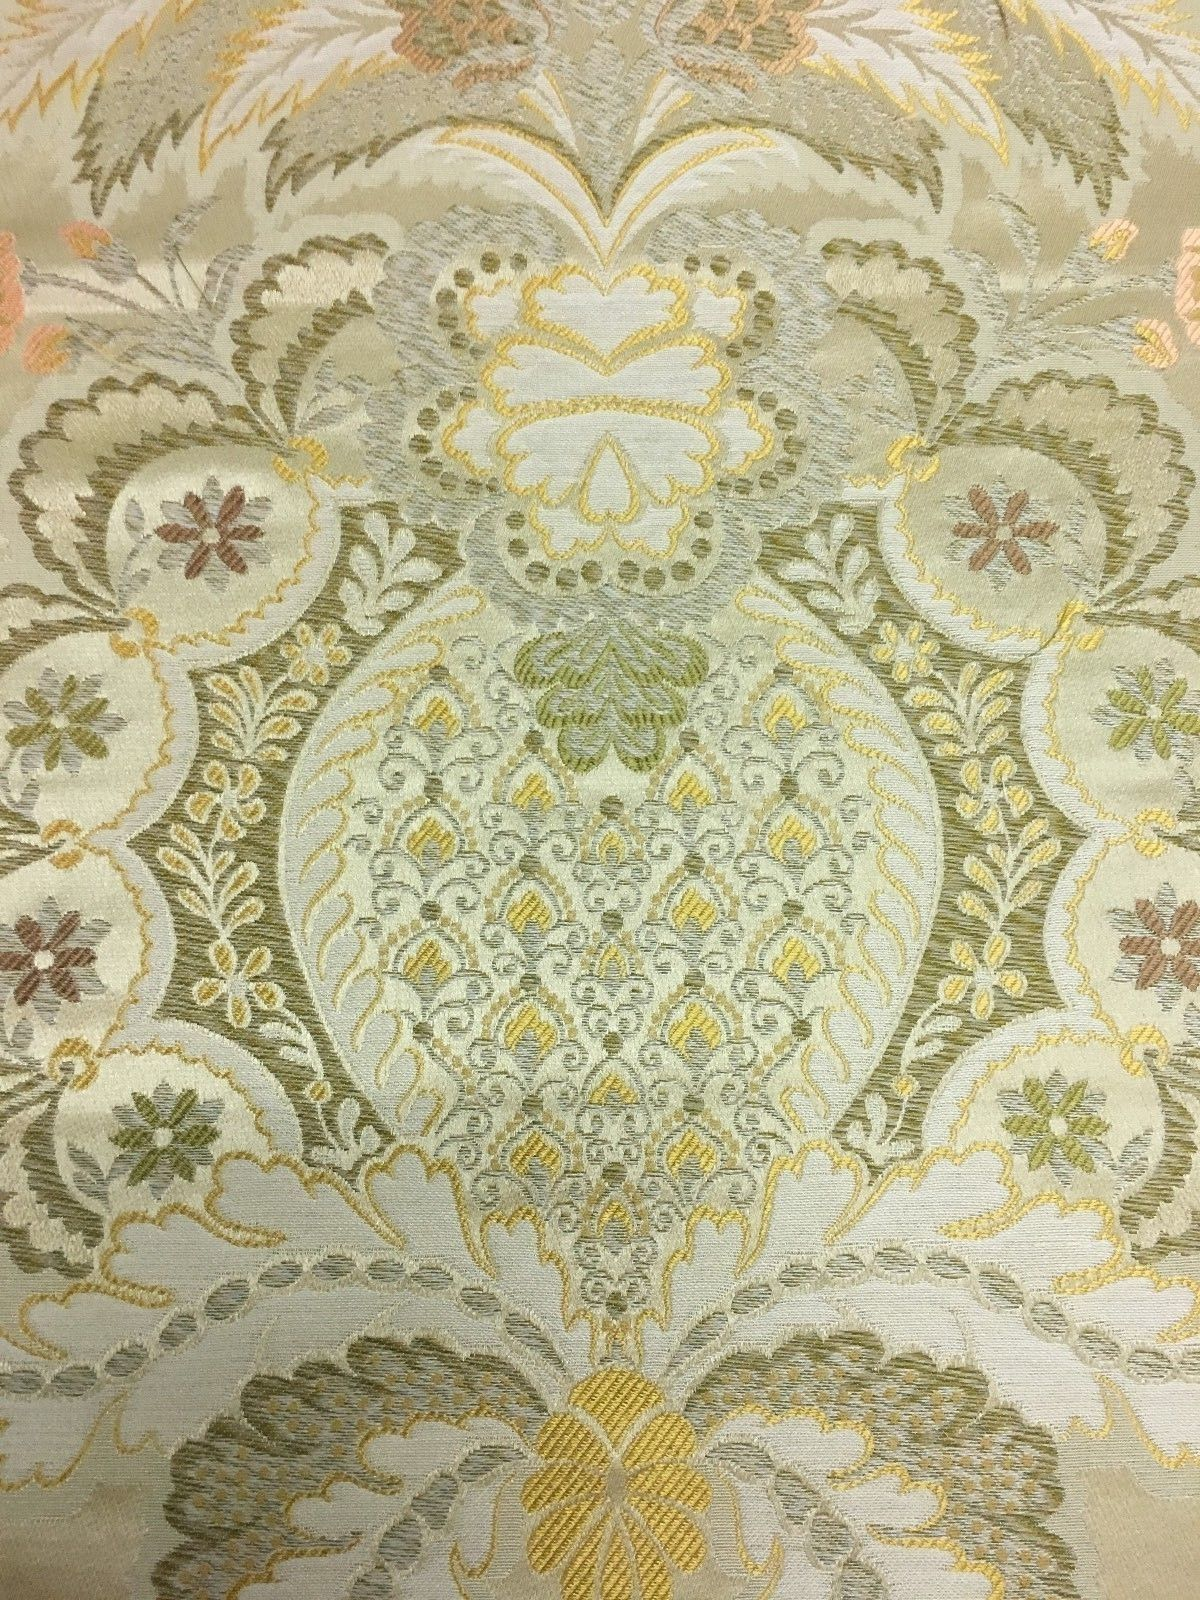 Damask Tela para Tapizar Múltiple Piezas Floral Dorado 3.1m Df